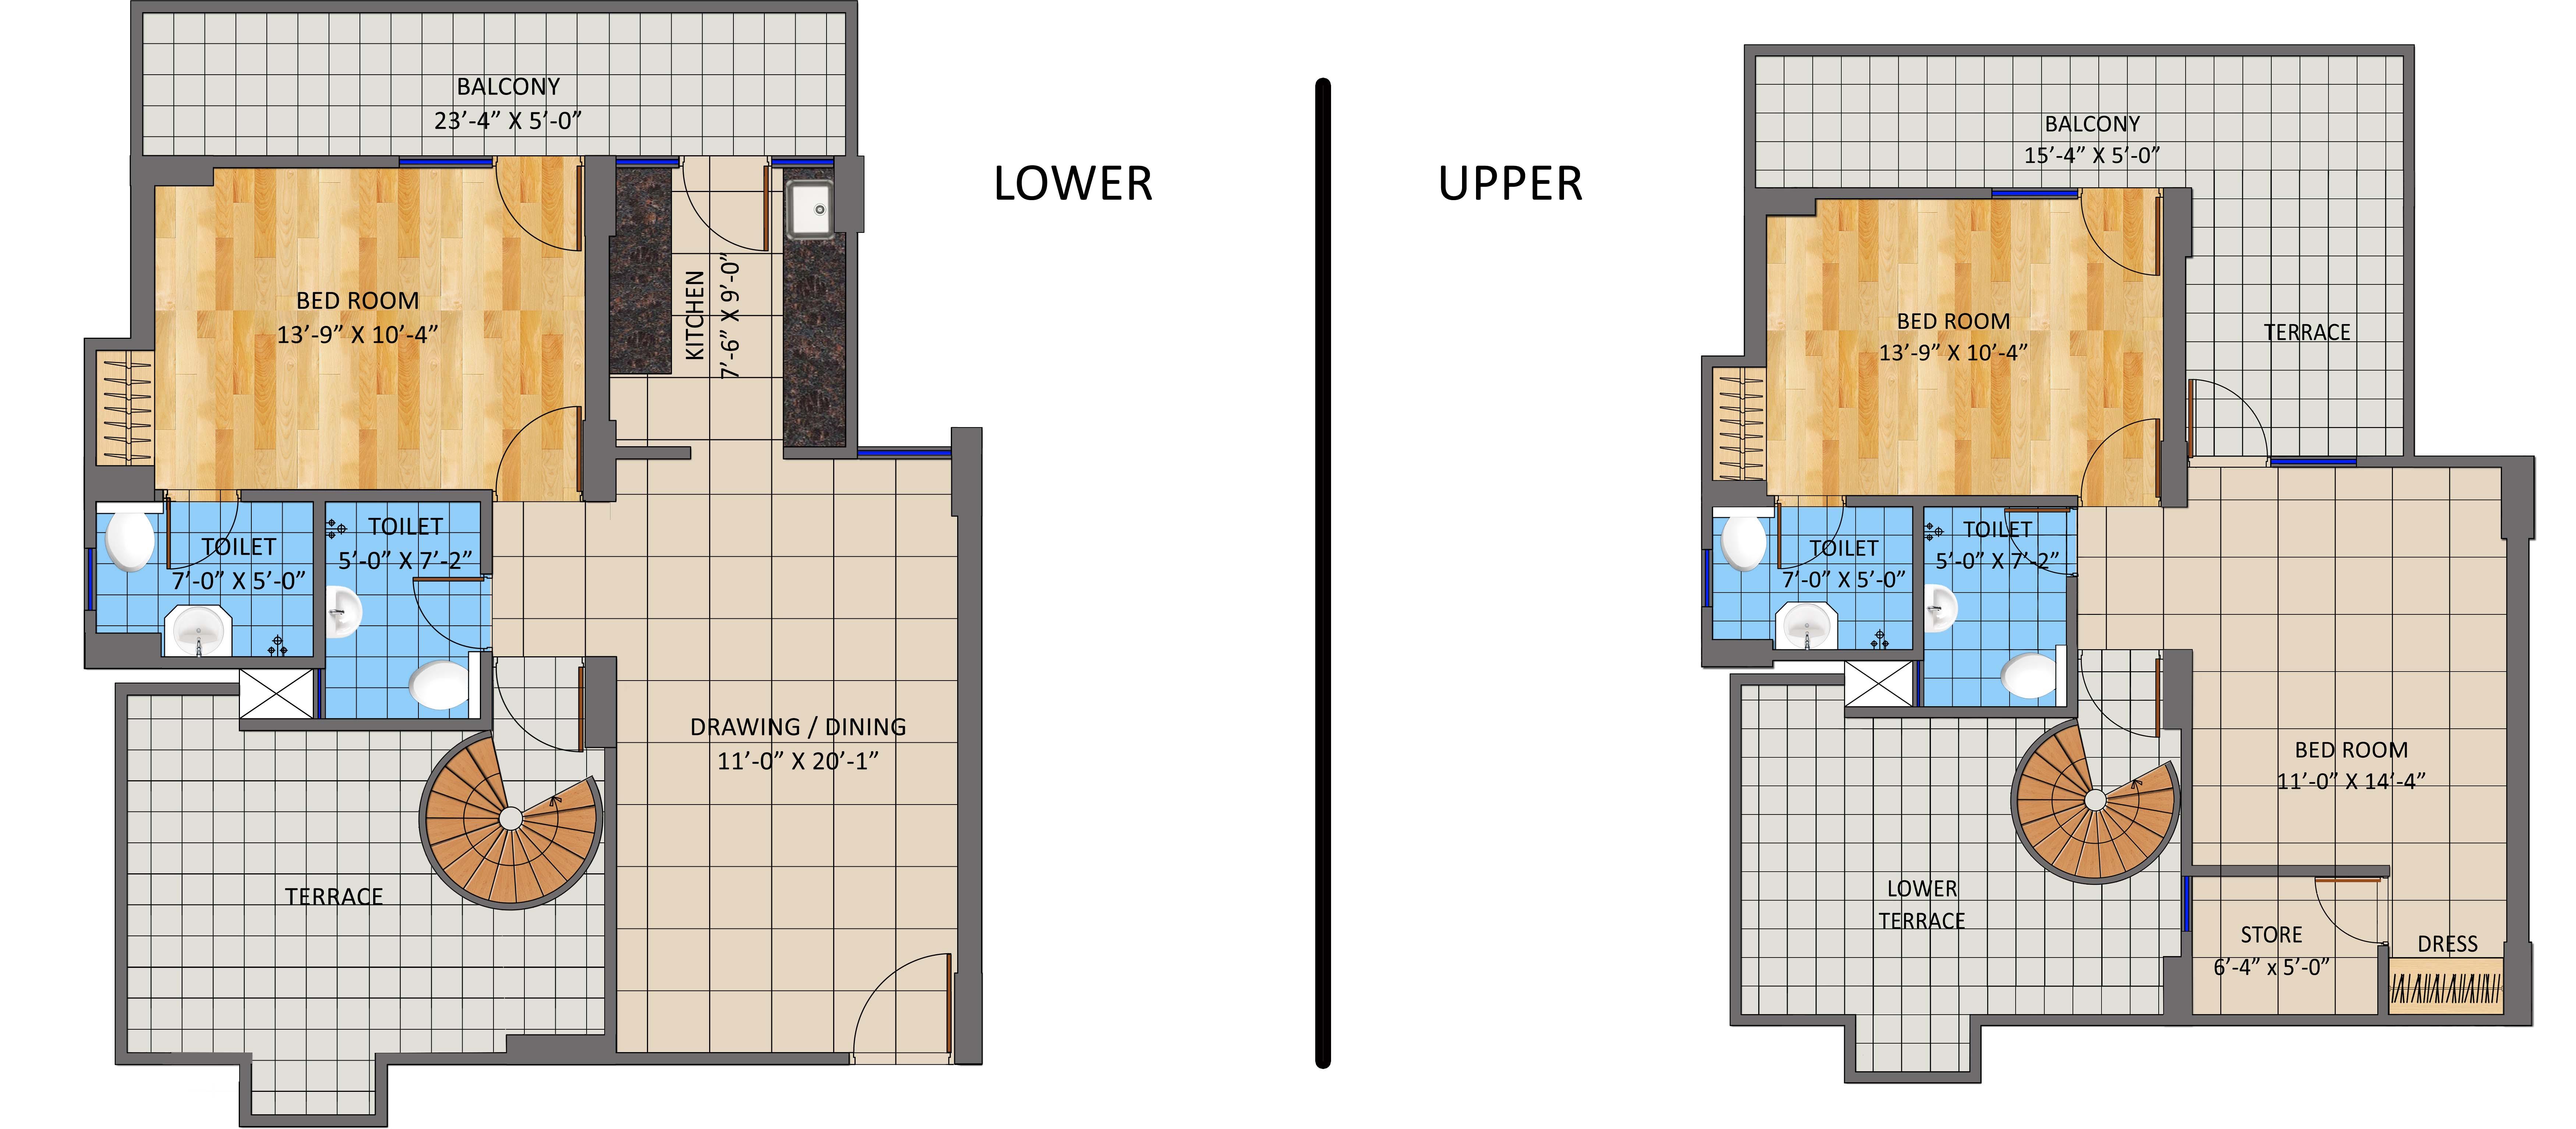 https://www.kwgroup.in/upload/170420110051Plan-Tower-E,-3-BHK-(Penthouse-Lower-&-Upper),-2000-sqft.jpg